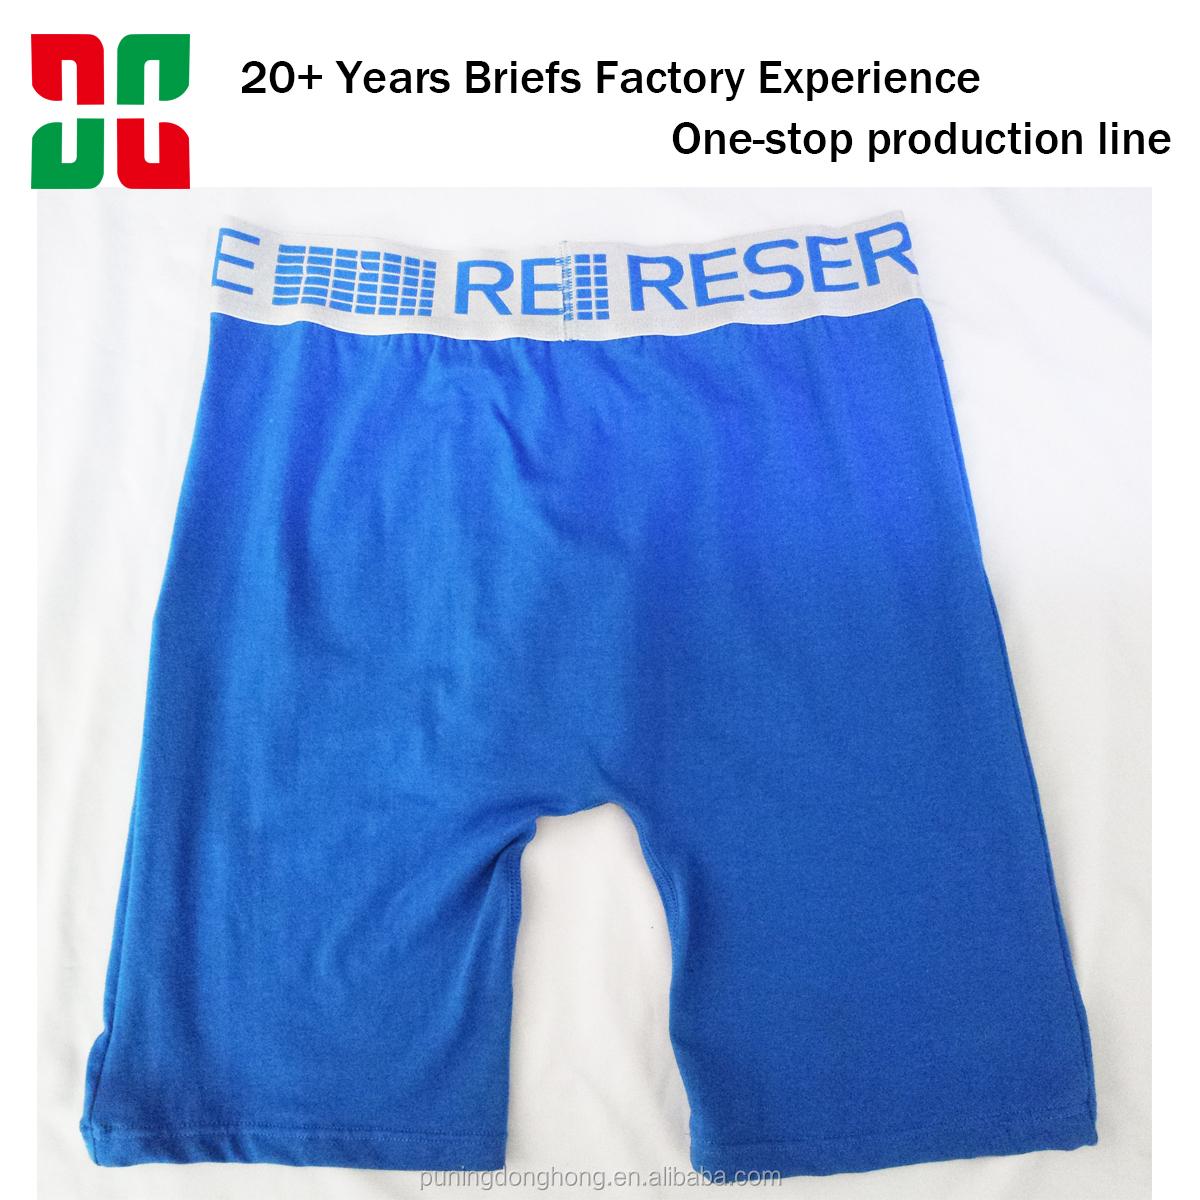 feb5027edb60 Oem No Rise Up Long Mans Jockey Underwear Man Brand - Buy Underwear ...